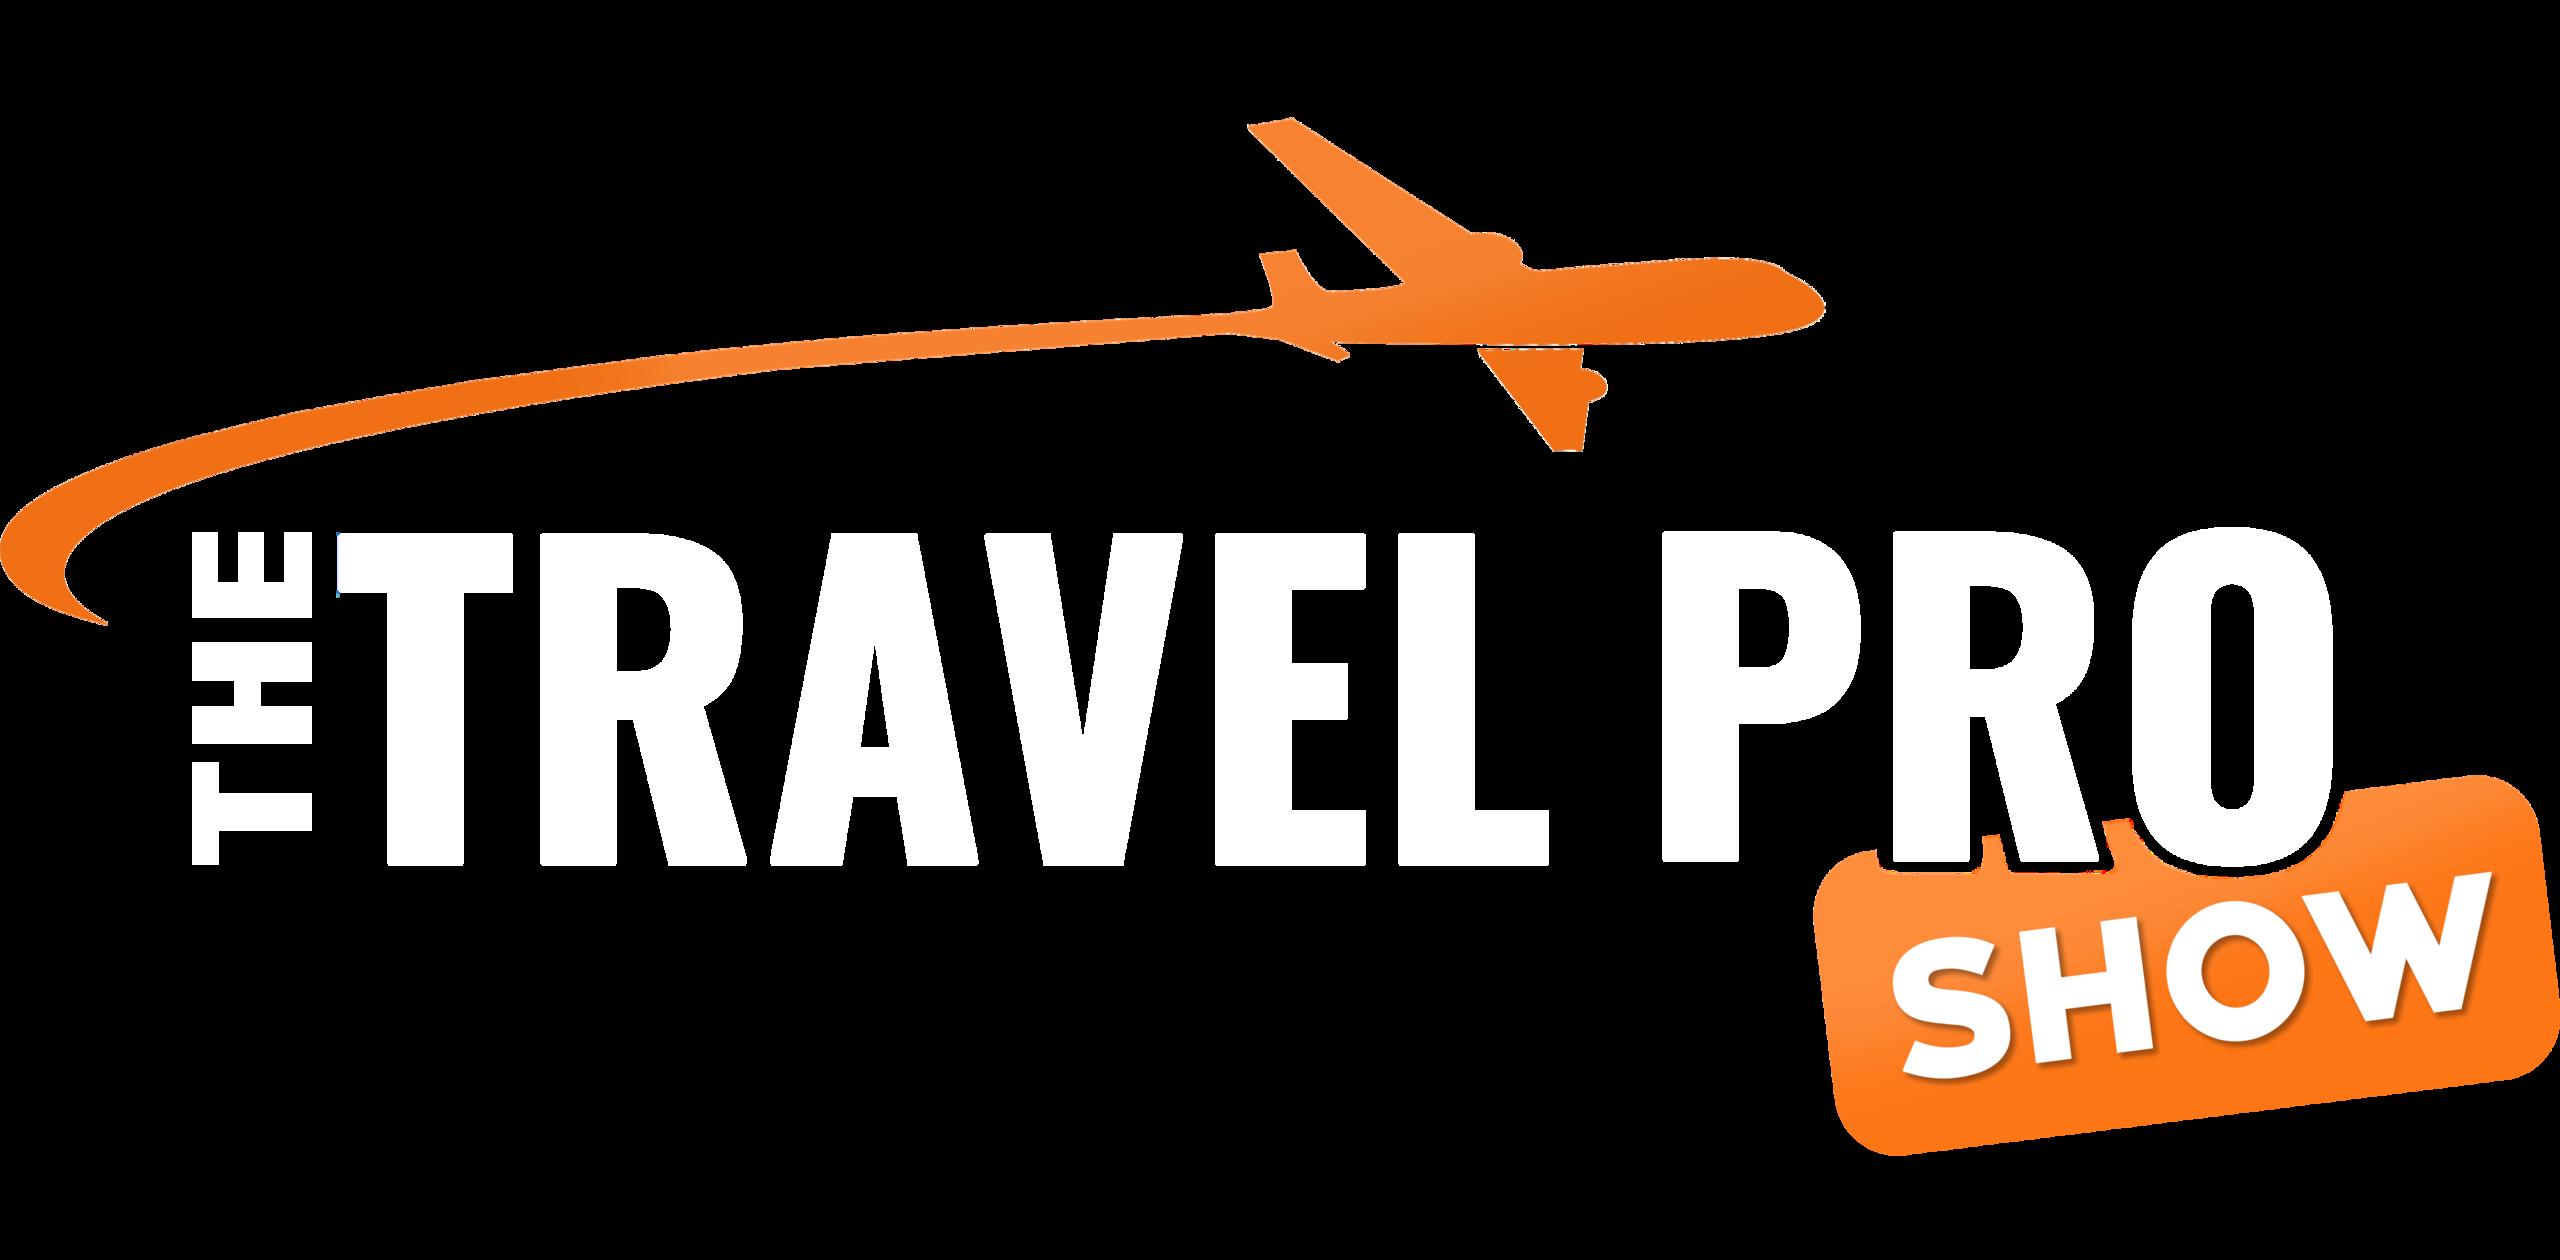 travel pro show logo